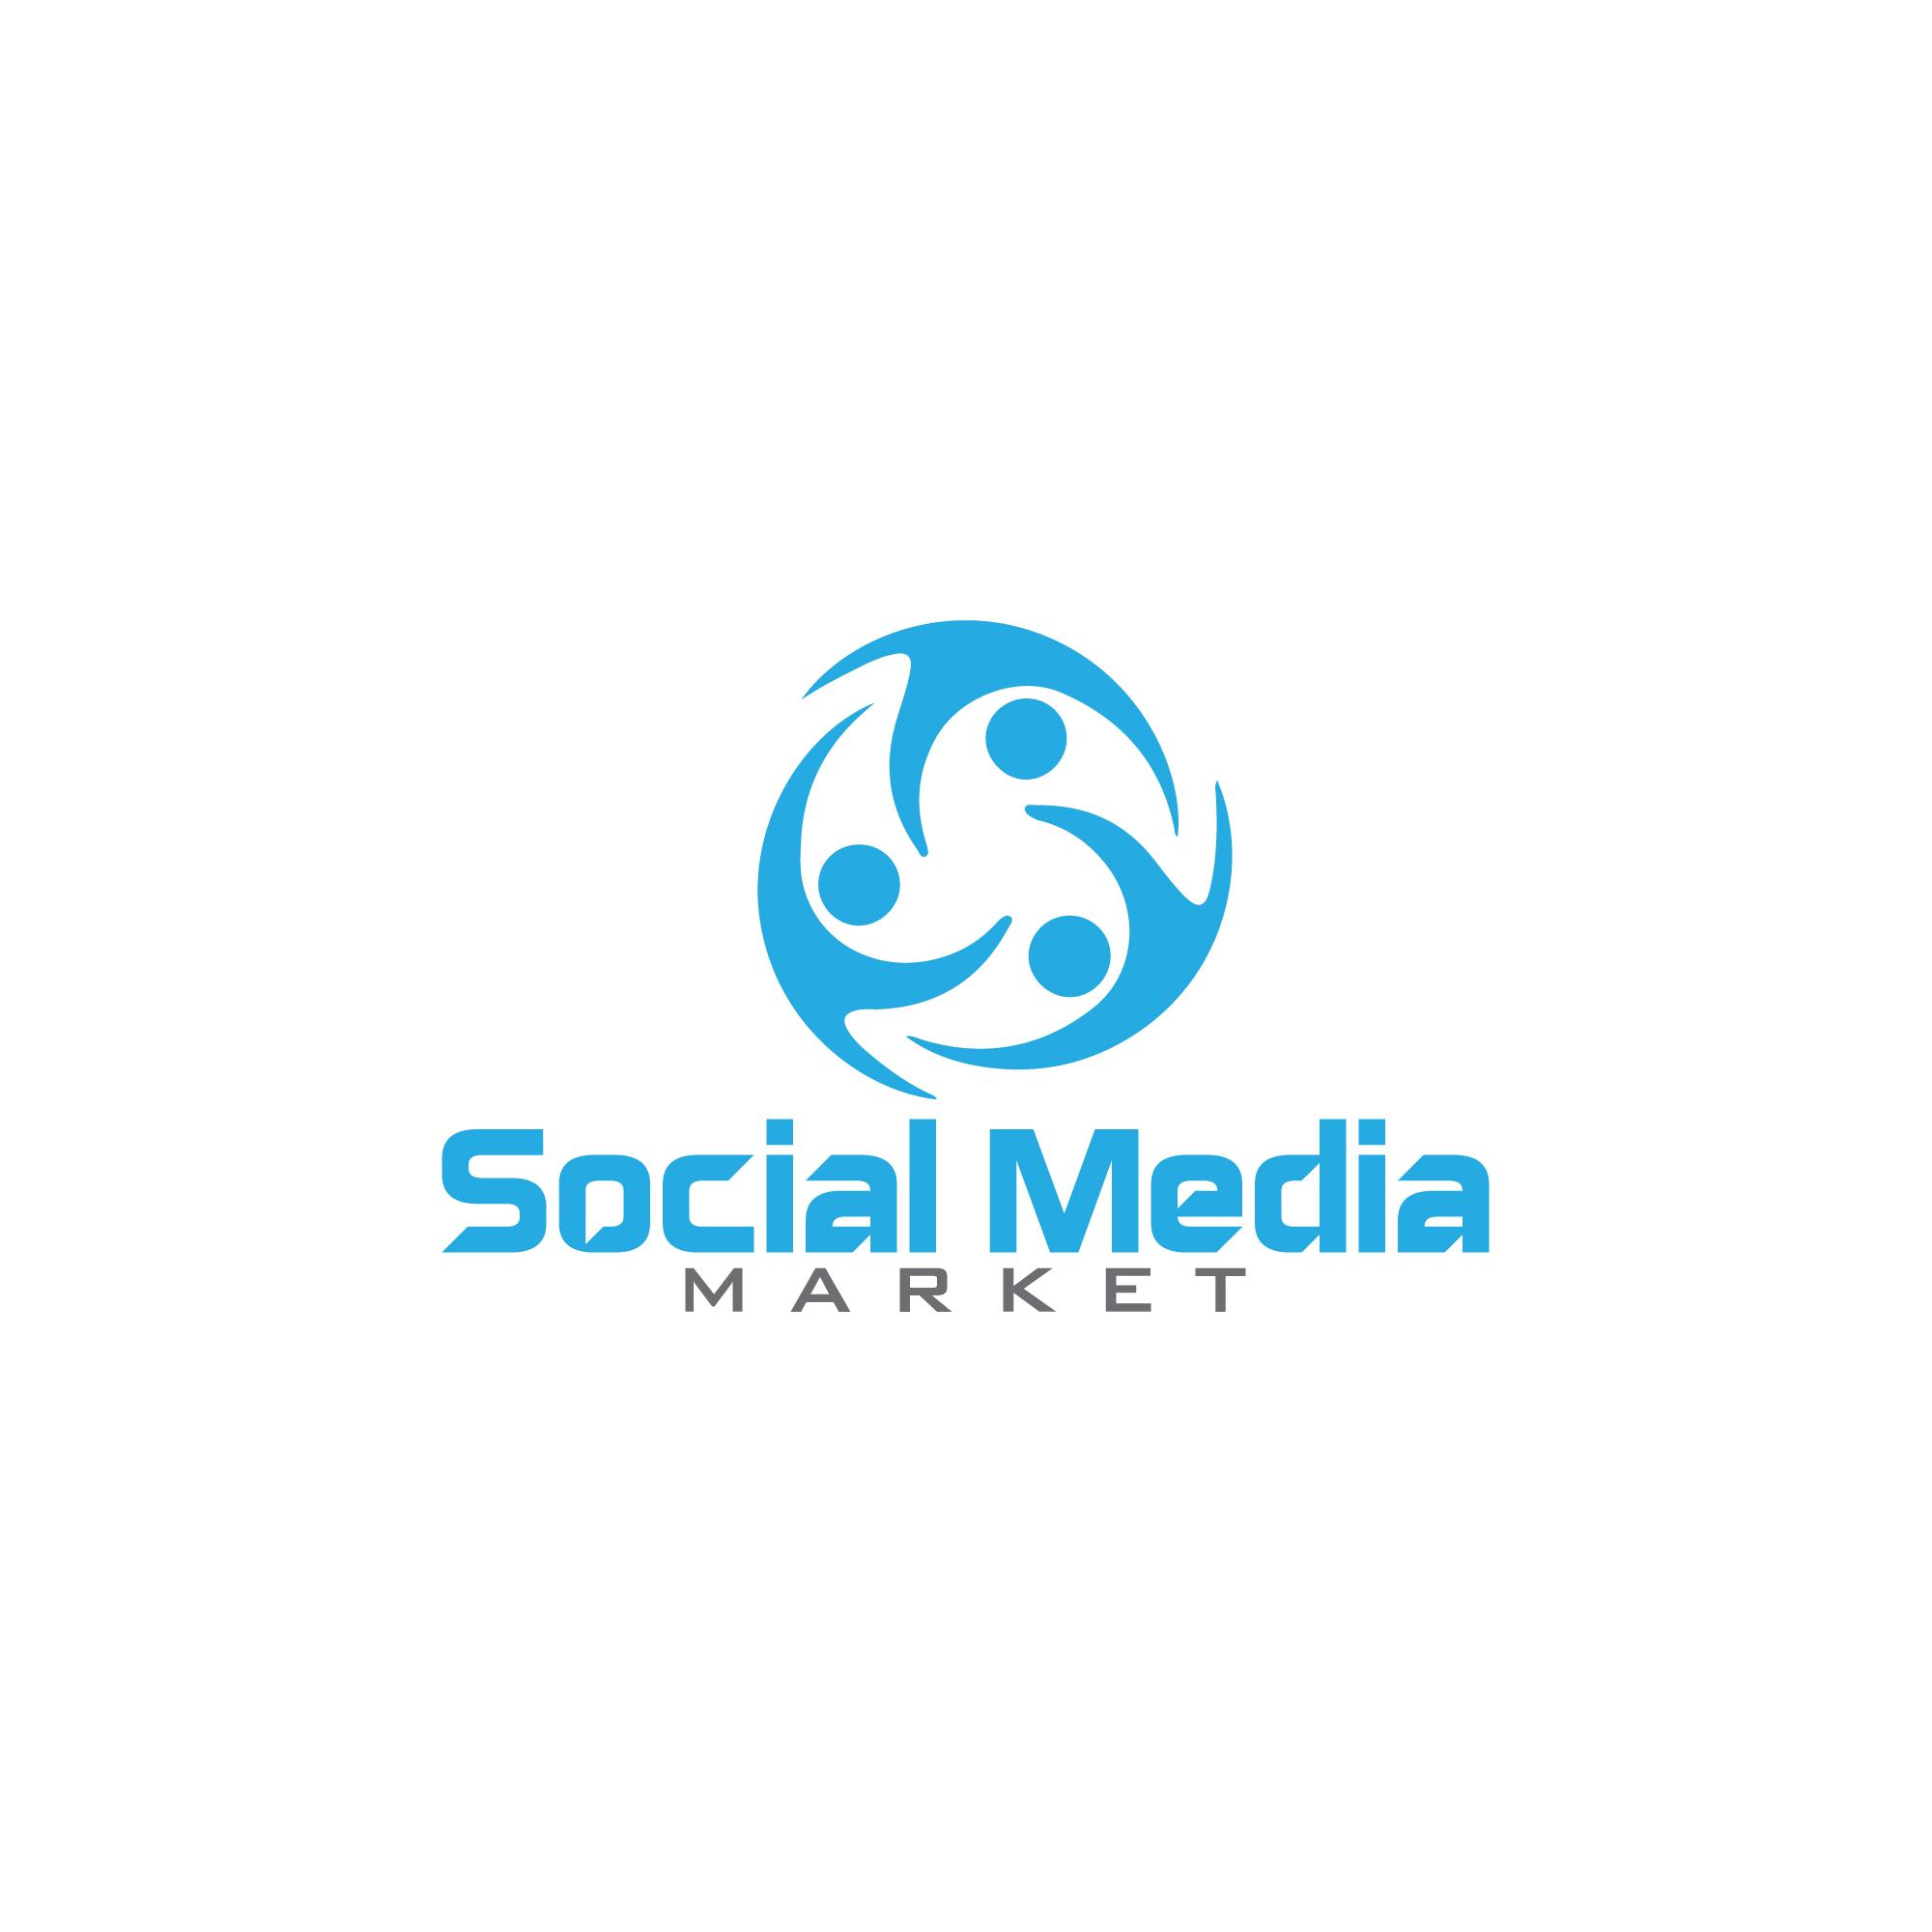 Logo von Social-Media-Market.de